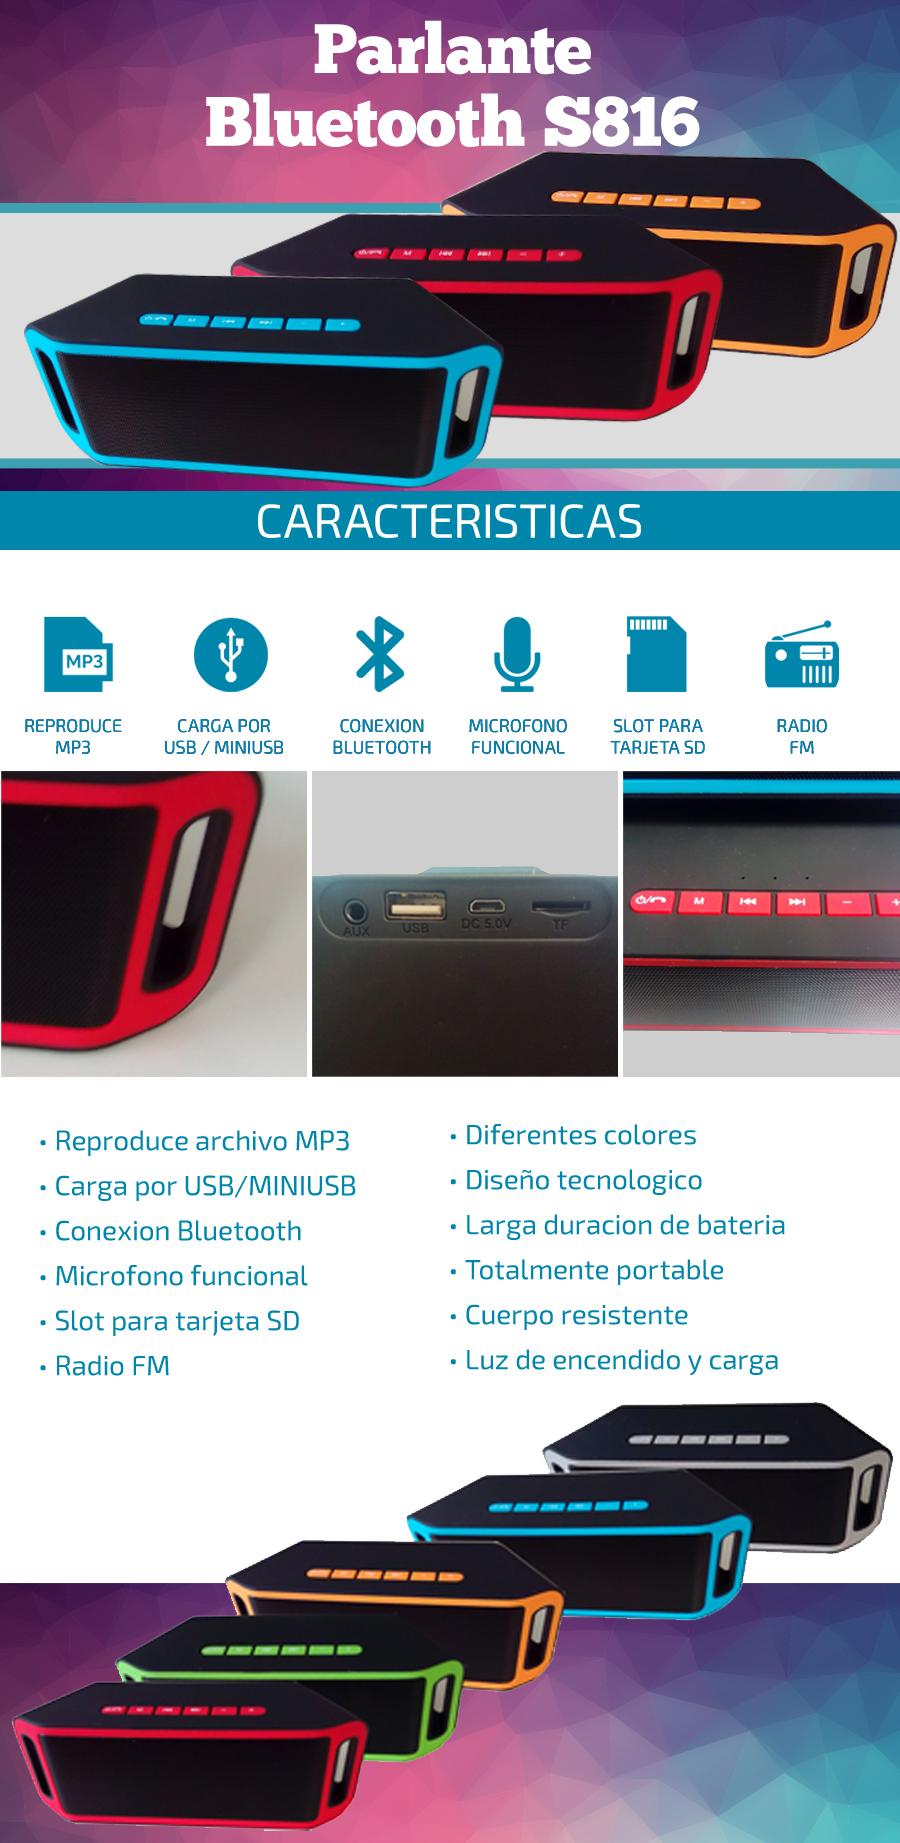 Parlante Bluetooth S816 | Radio FM / Slot SD|